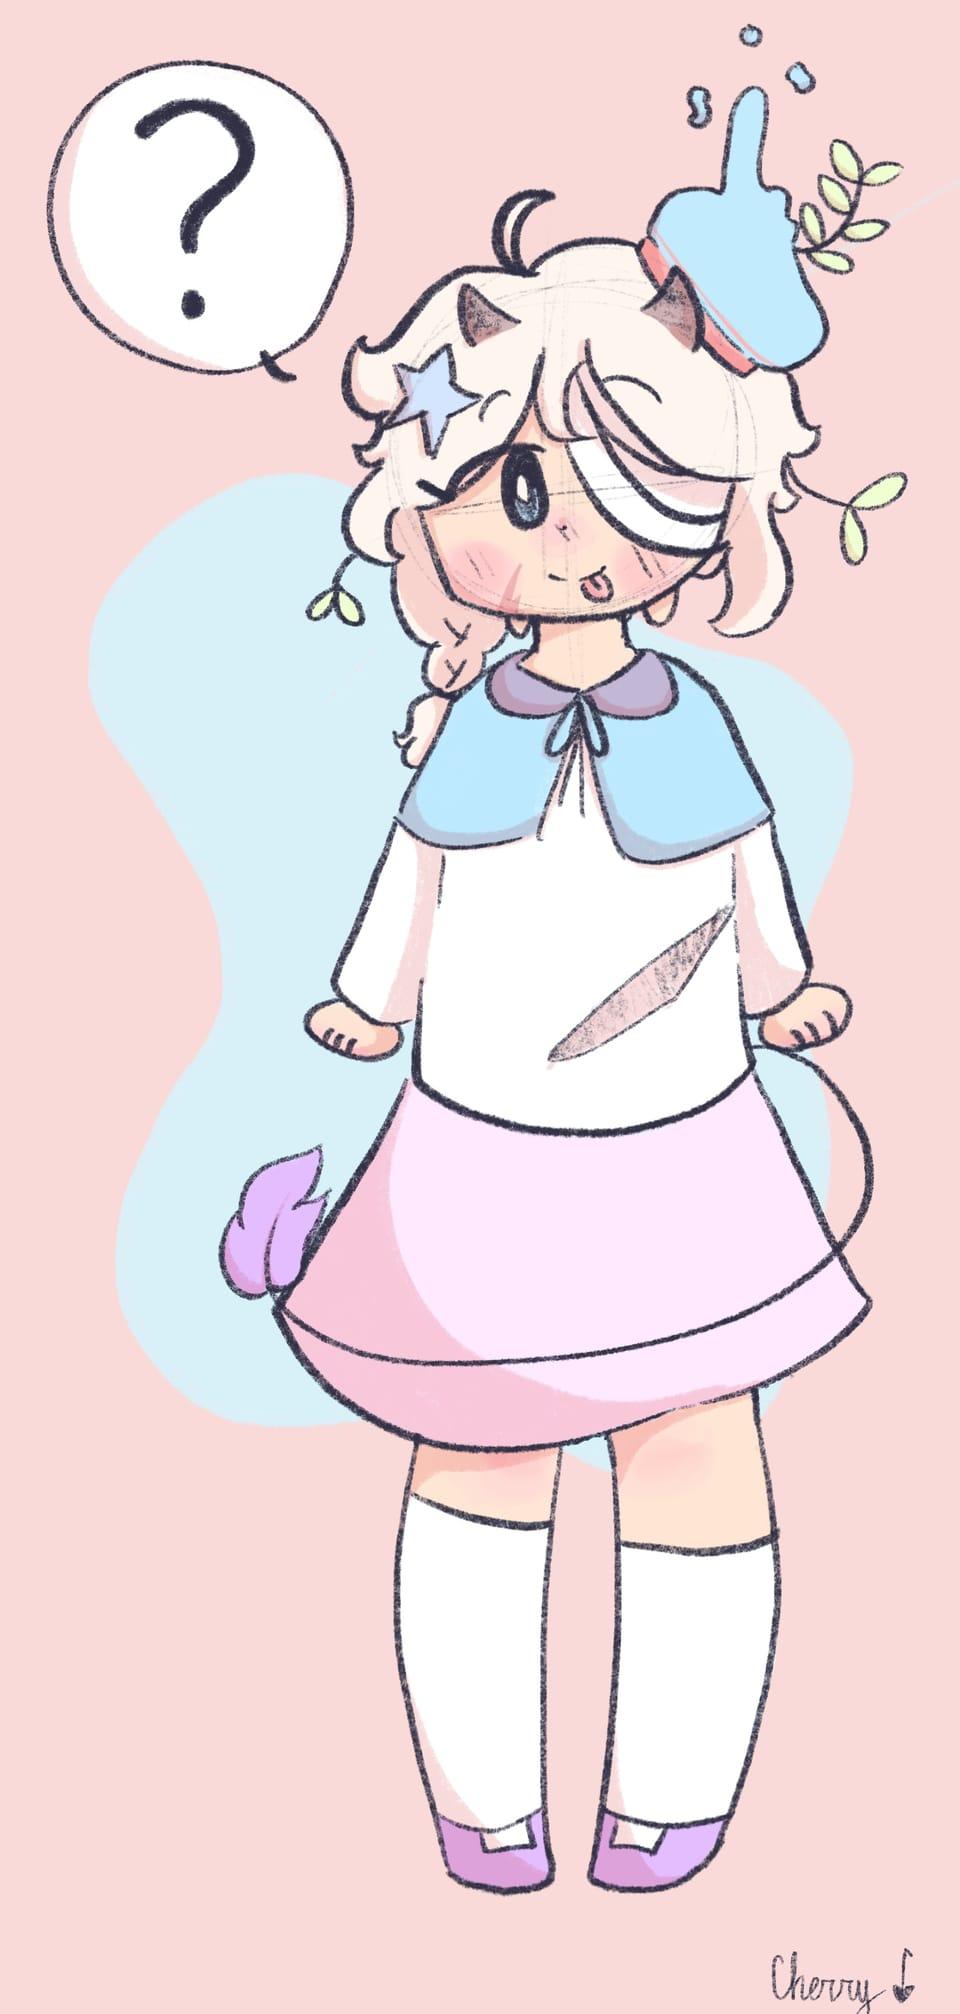 Adopt from sydsbrain Illust of Cherry 🍒 (skid mode) oc drawing cute